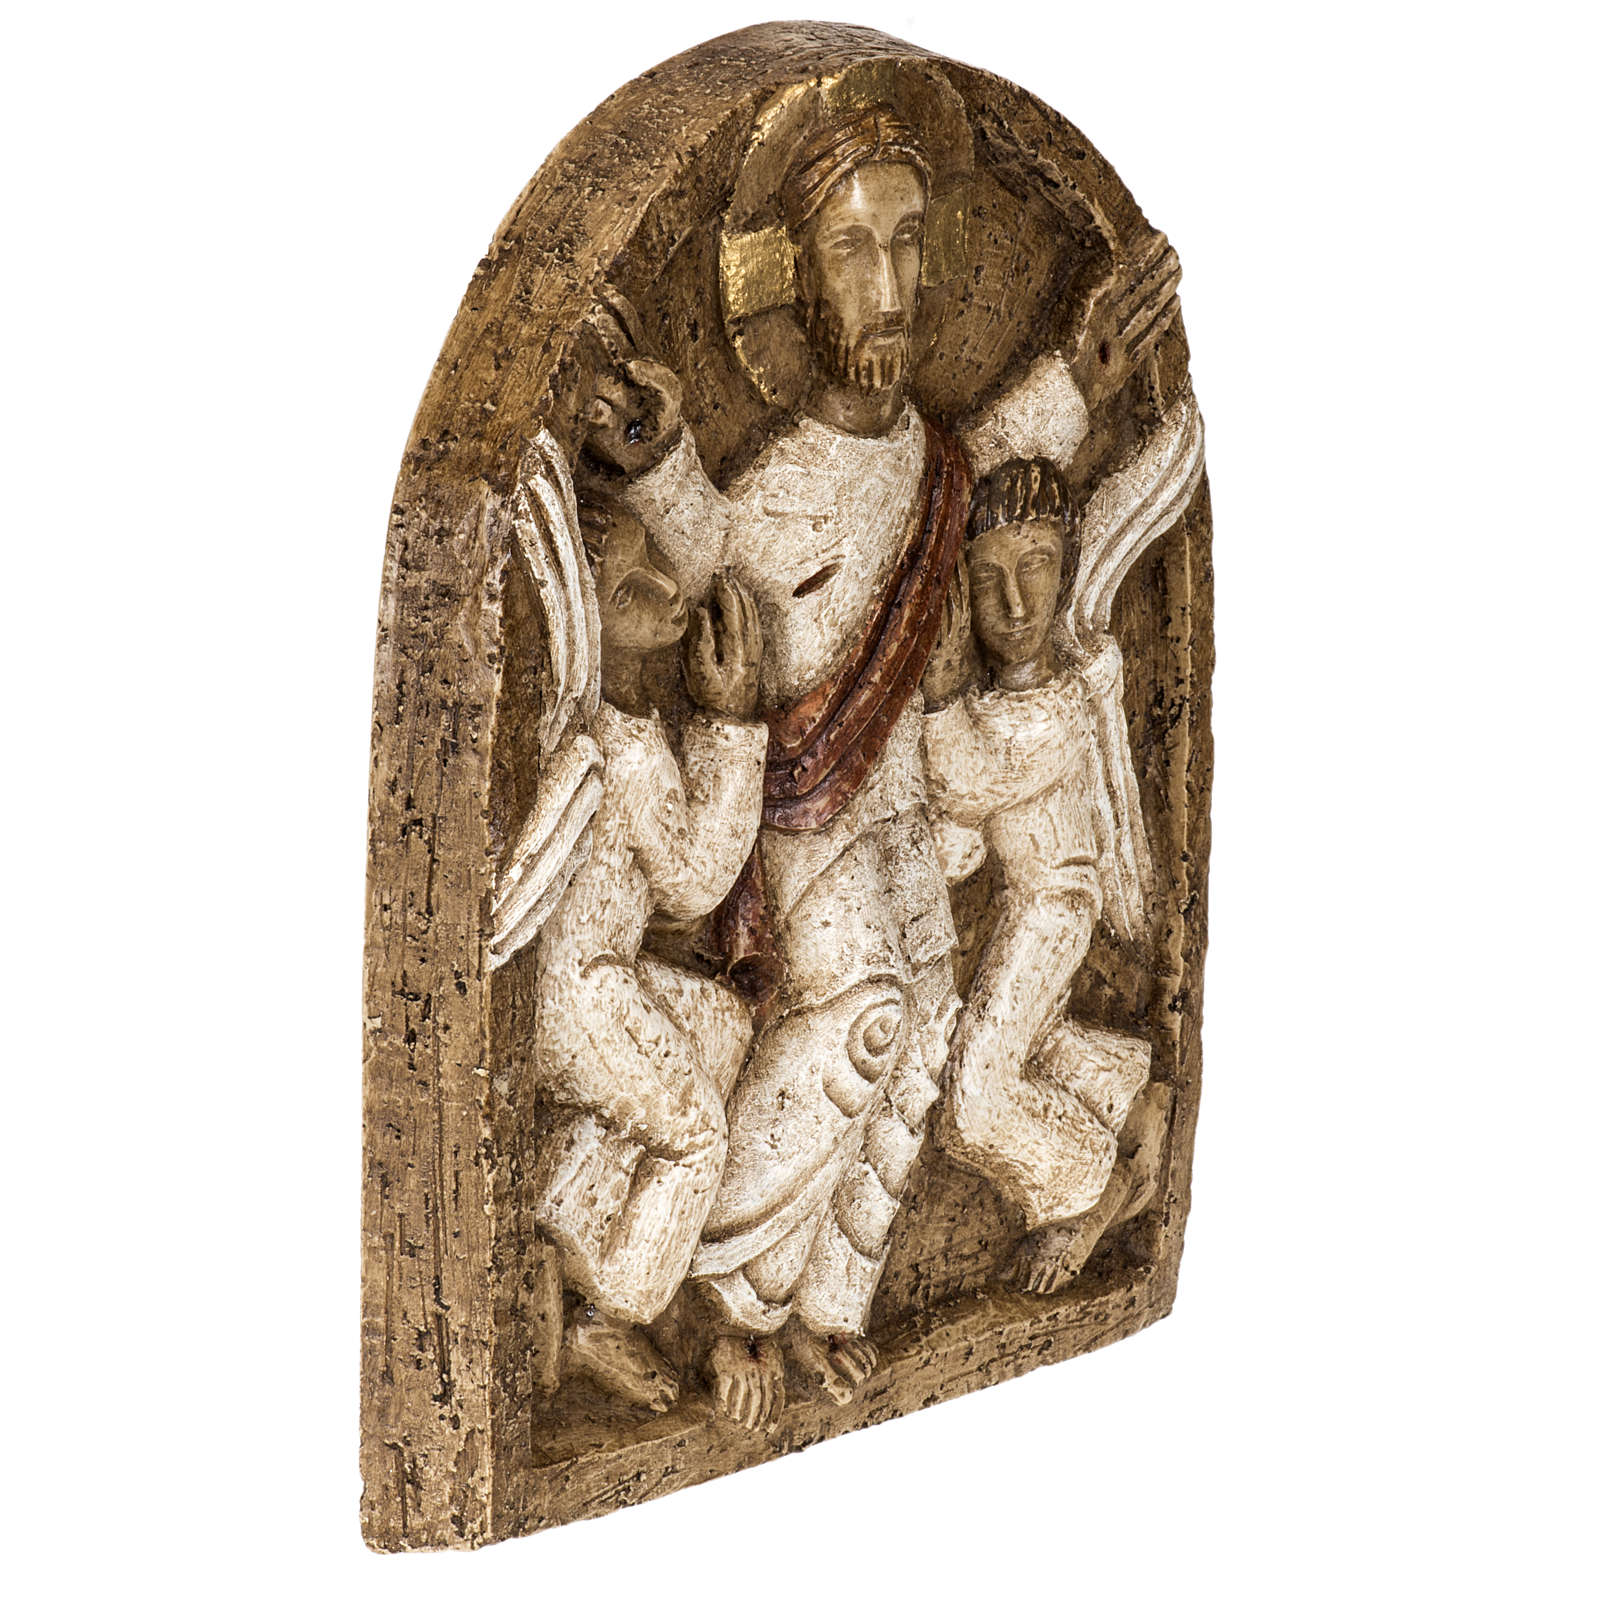 Ascensione bassorilievo pietra Bethléem 4